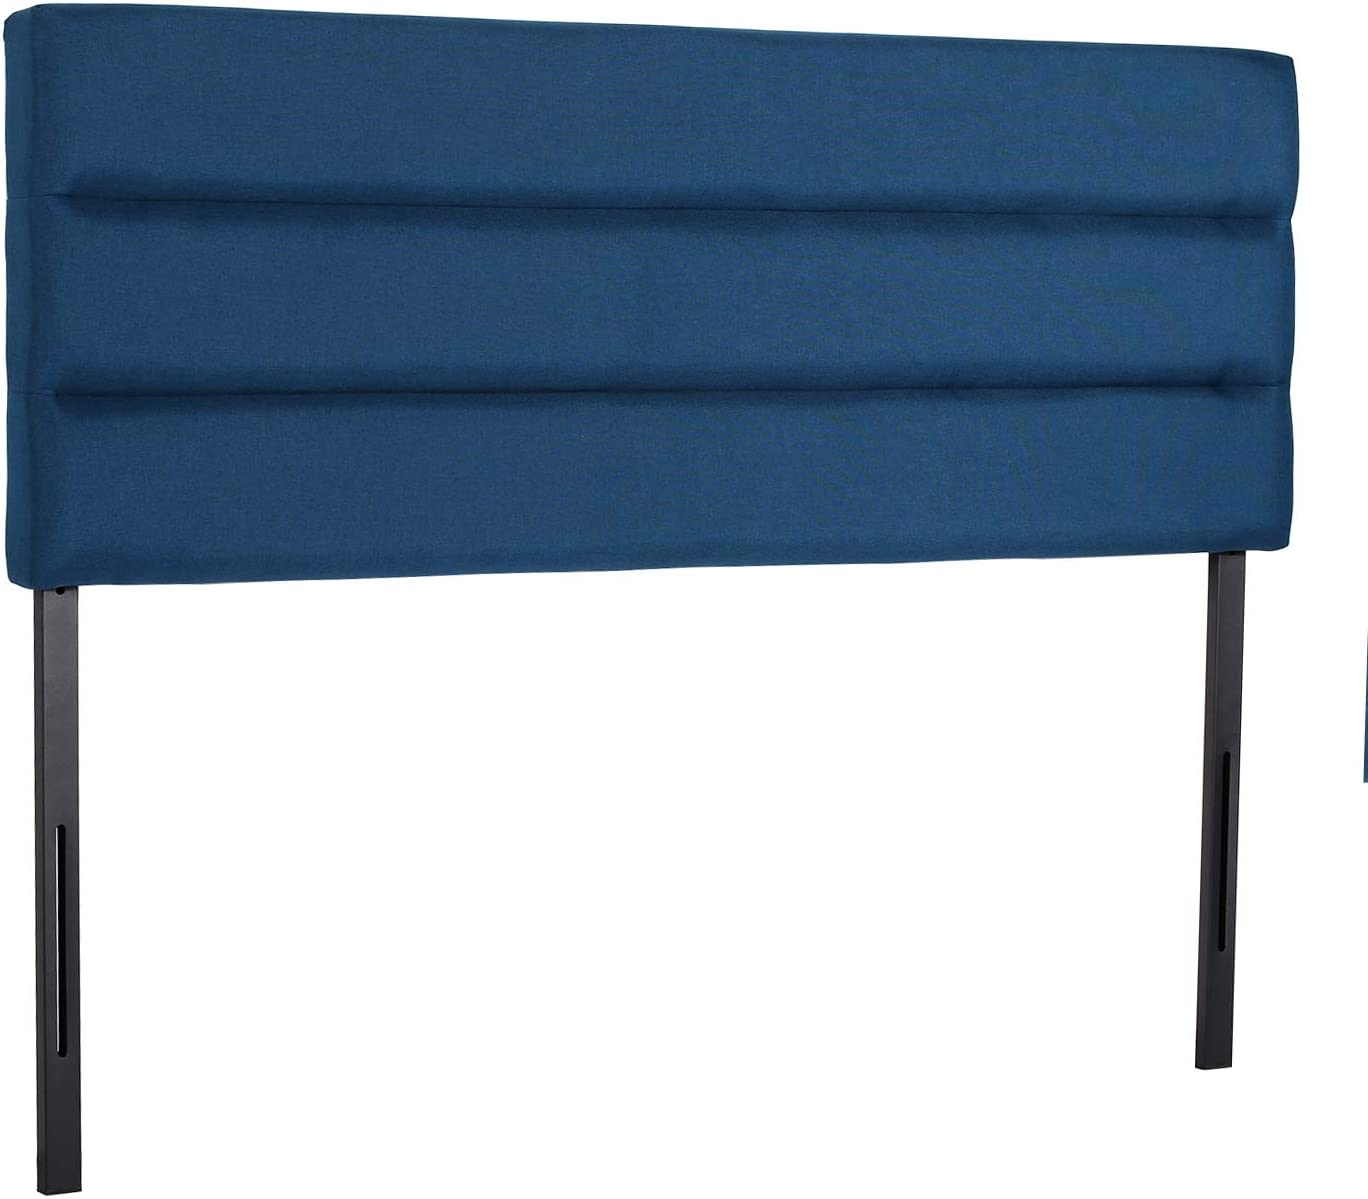 VECELO Upholstered Height Adjustable in ご予約品 Headboard Fabric Linen 現品